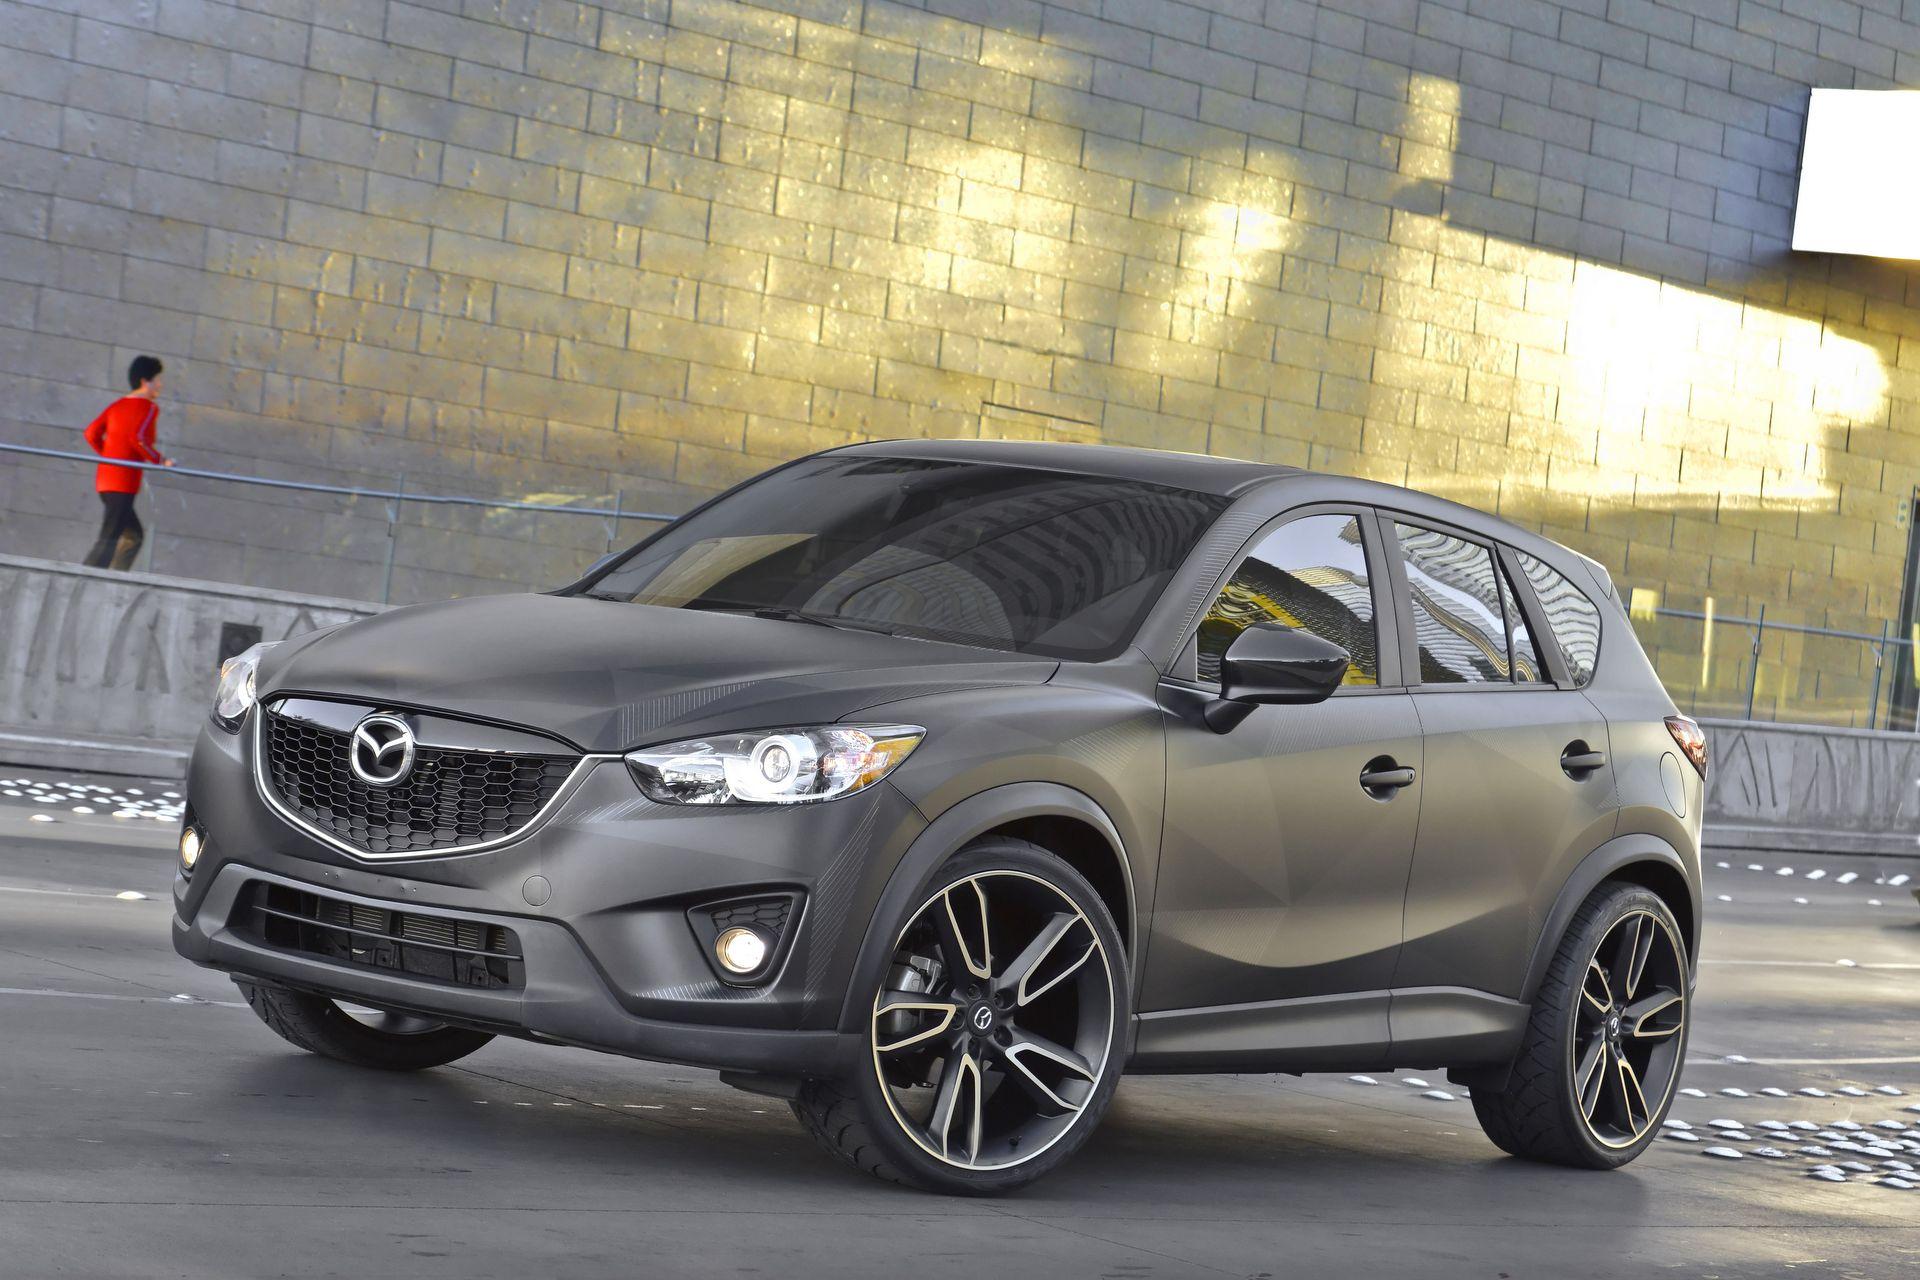 Scorpio Car Wallpaper Custom Mazda Cx 5 Urban Unveiled At Sema 2012 Forcegt Com